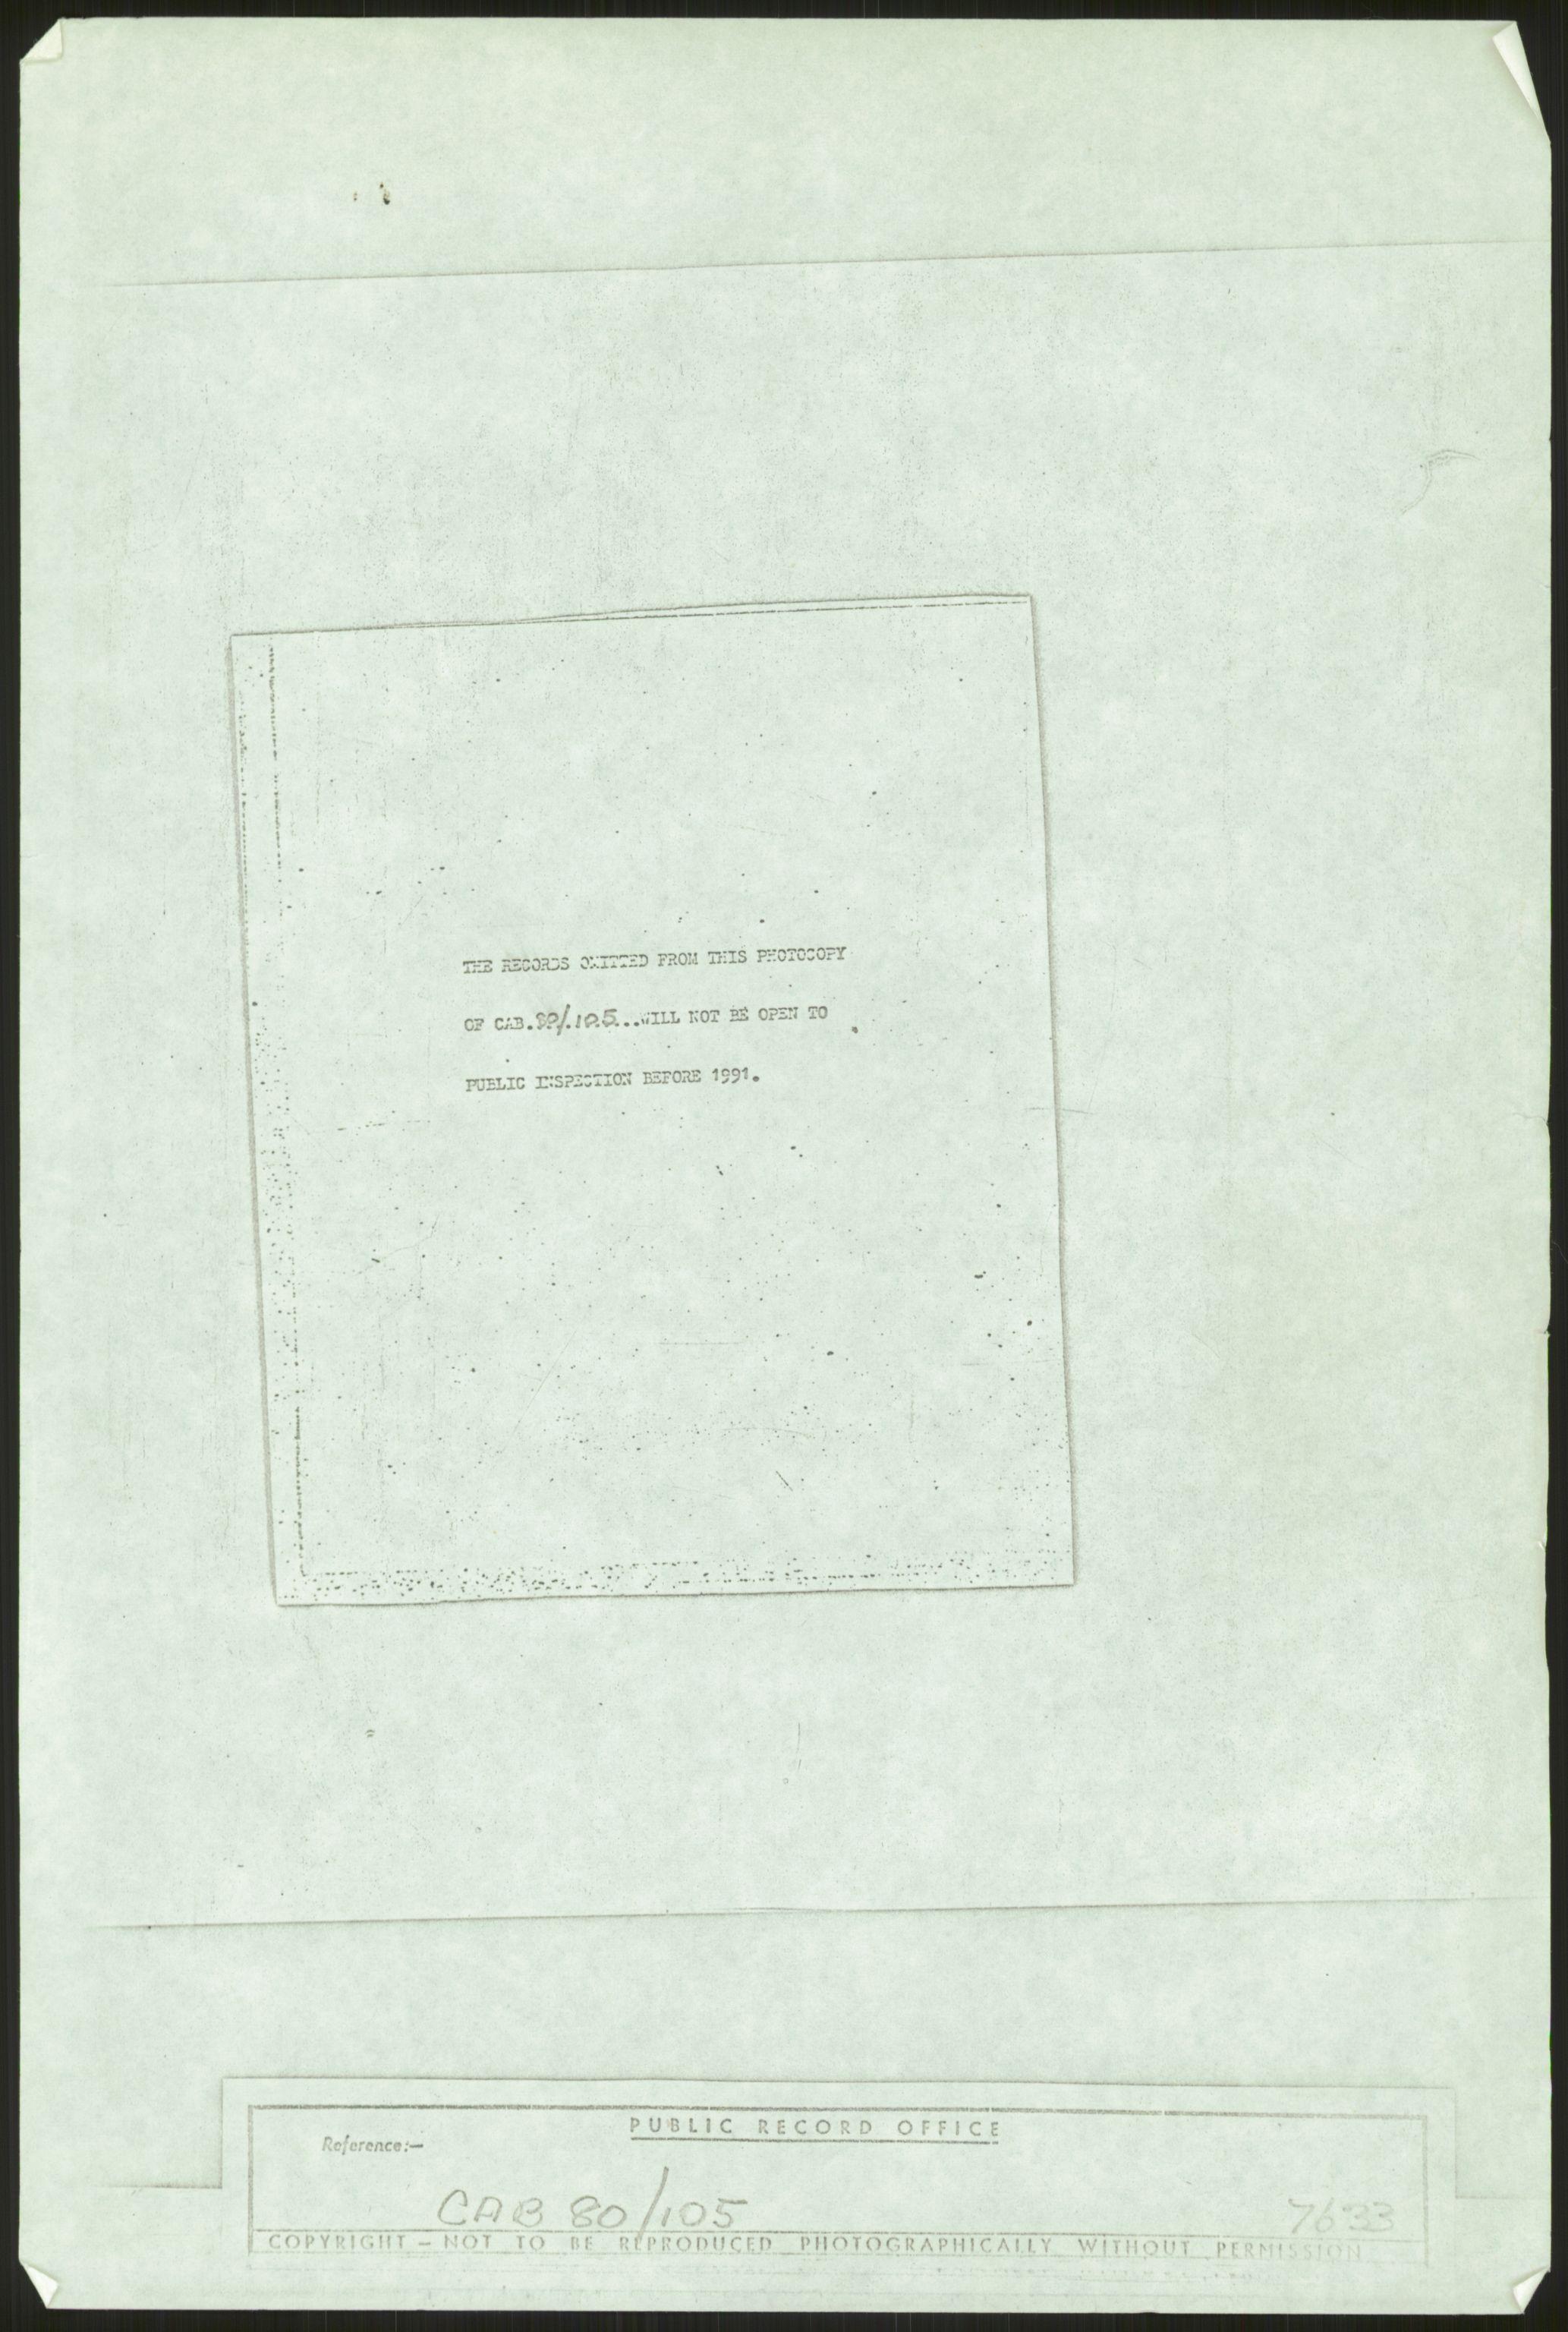 RA, Skodvin, Magne, F/L0006: Kopier fra Public Record Office, 1940